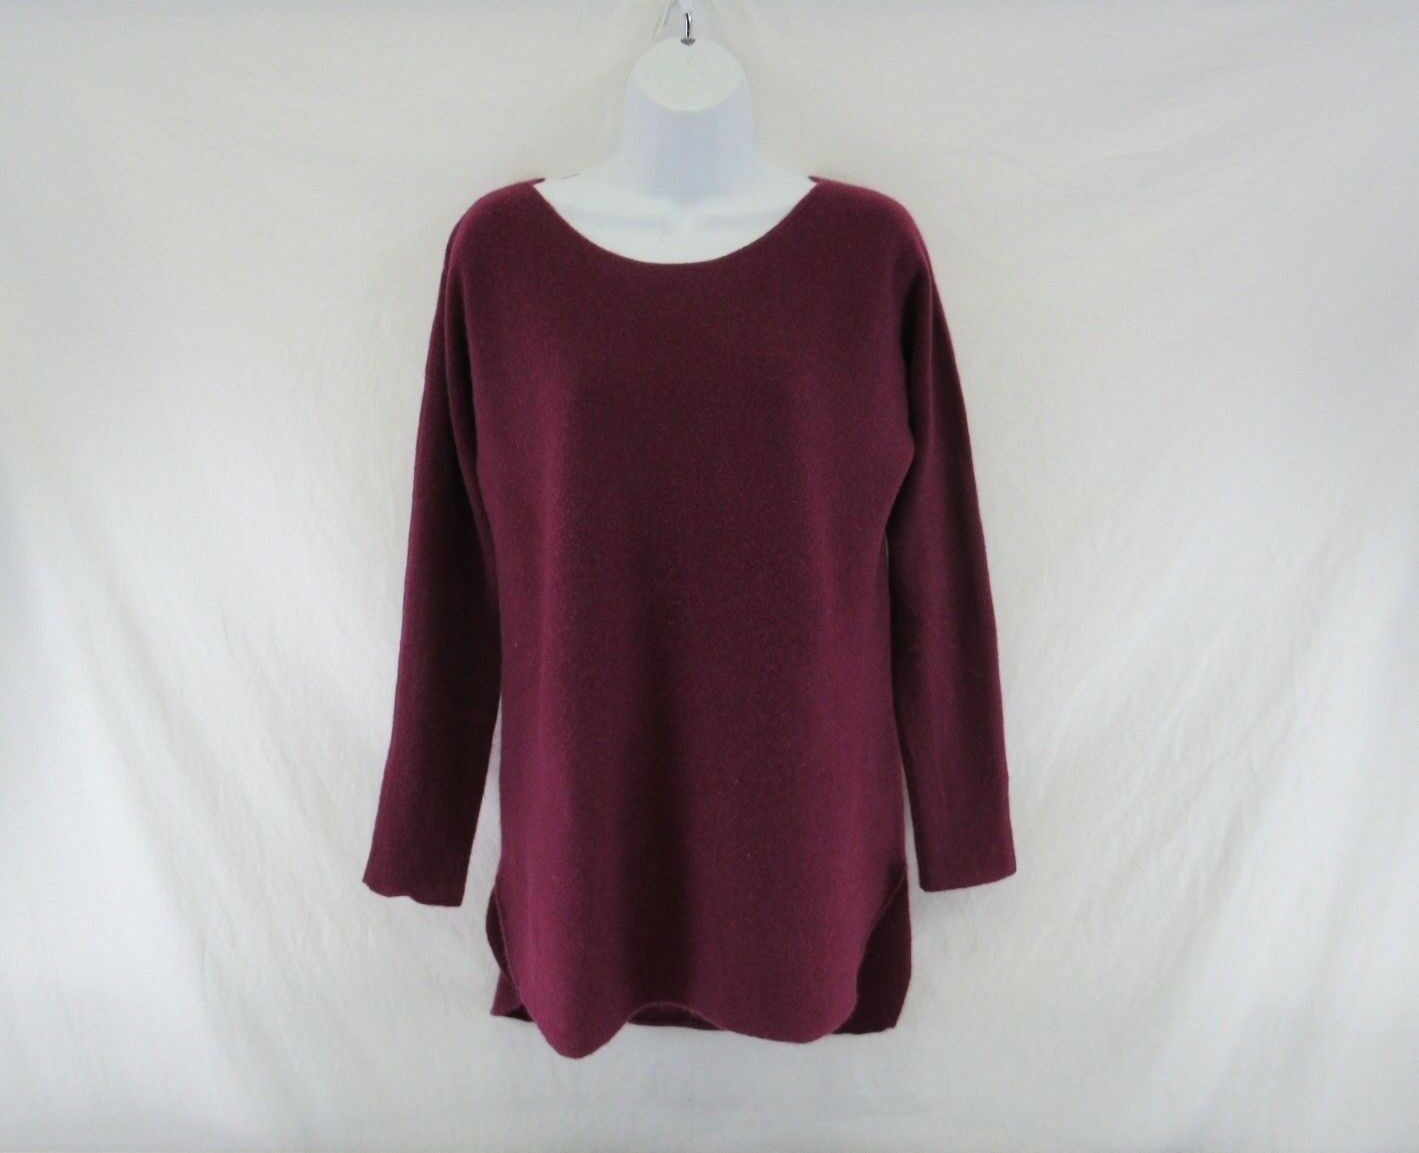 Women's Halogen 100% Cashmere Plum Long Sleeve Sweater Size S  KK686